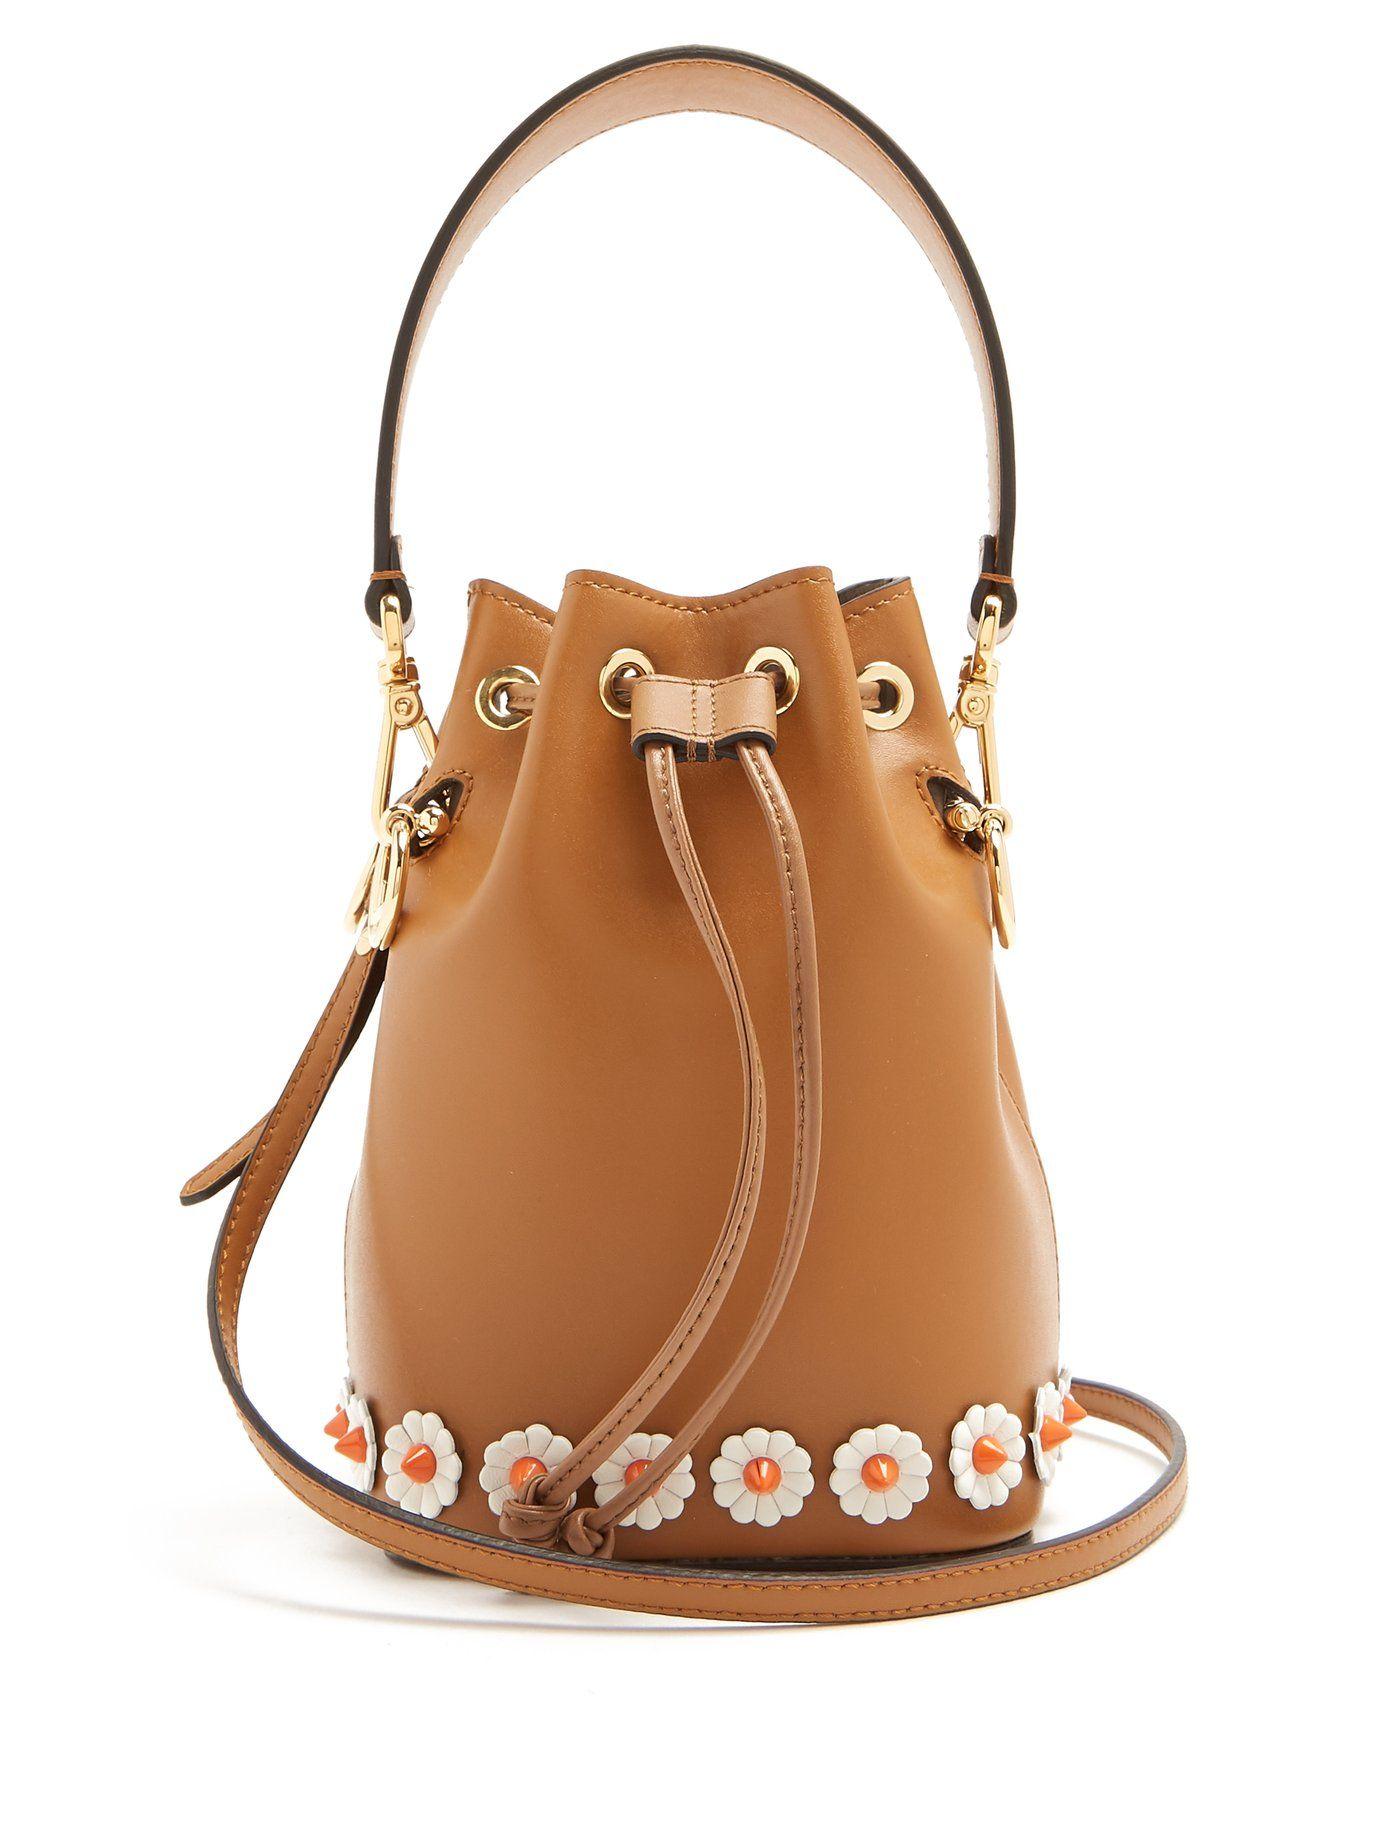 085889e7b292 My Treasure leather bucket bag